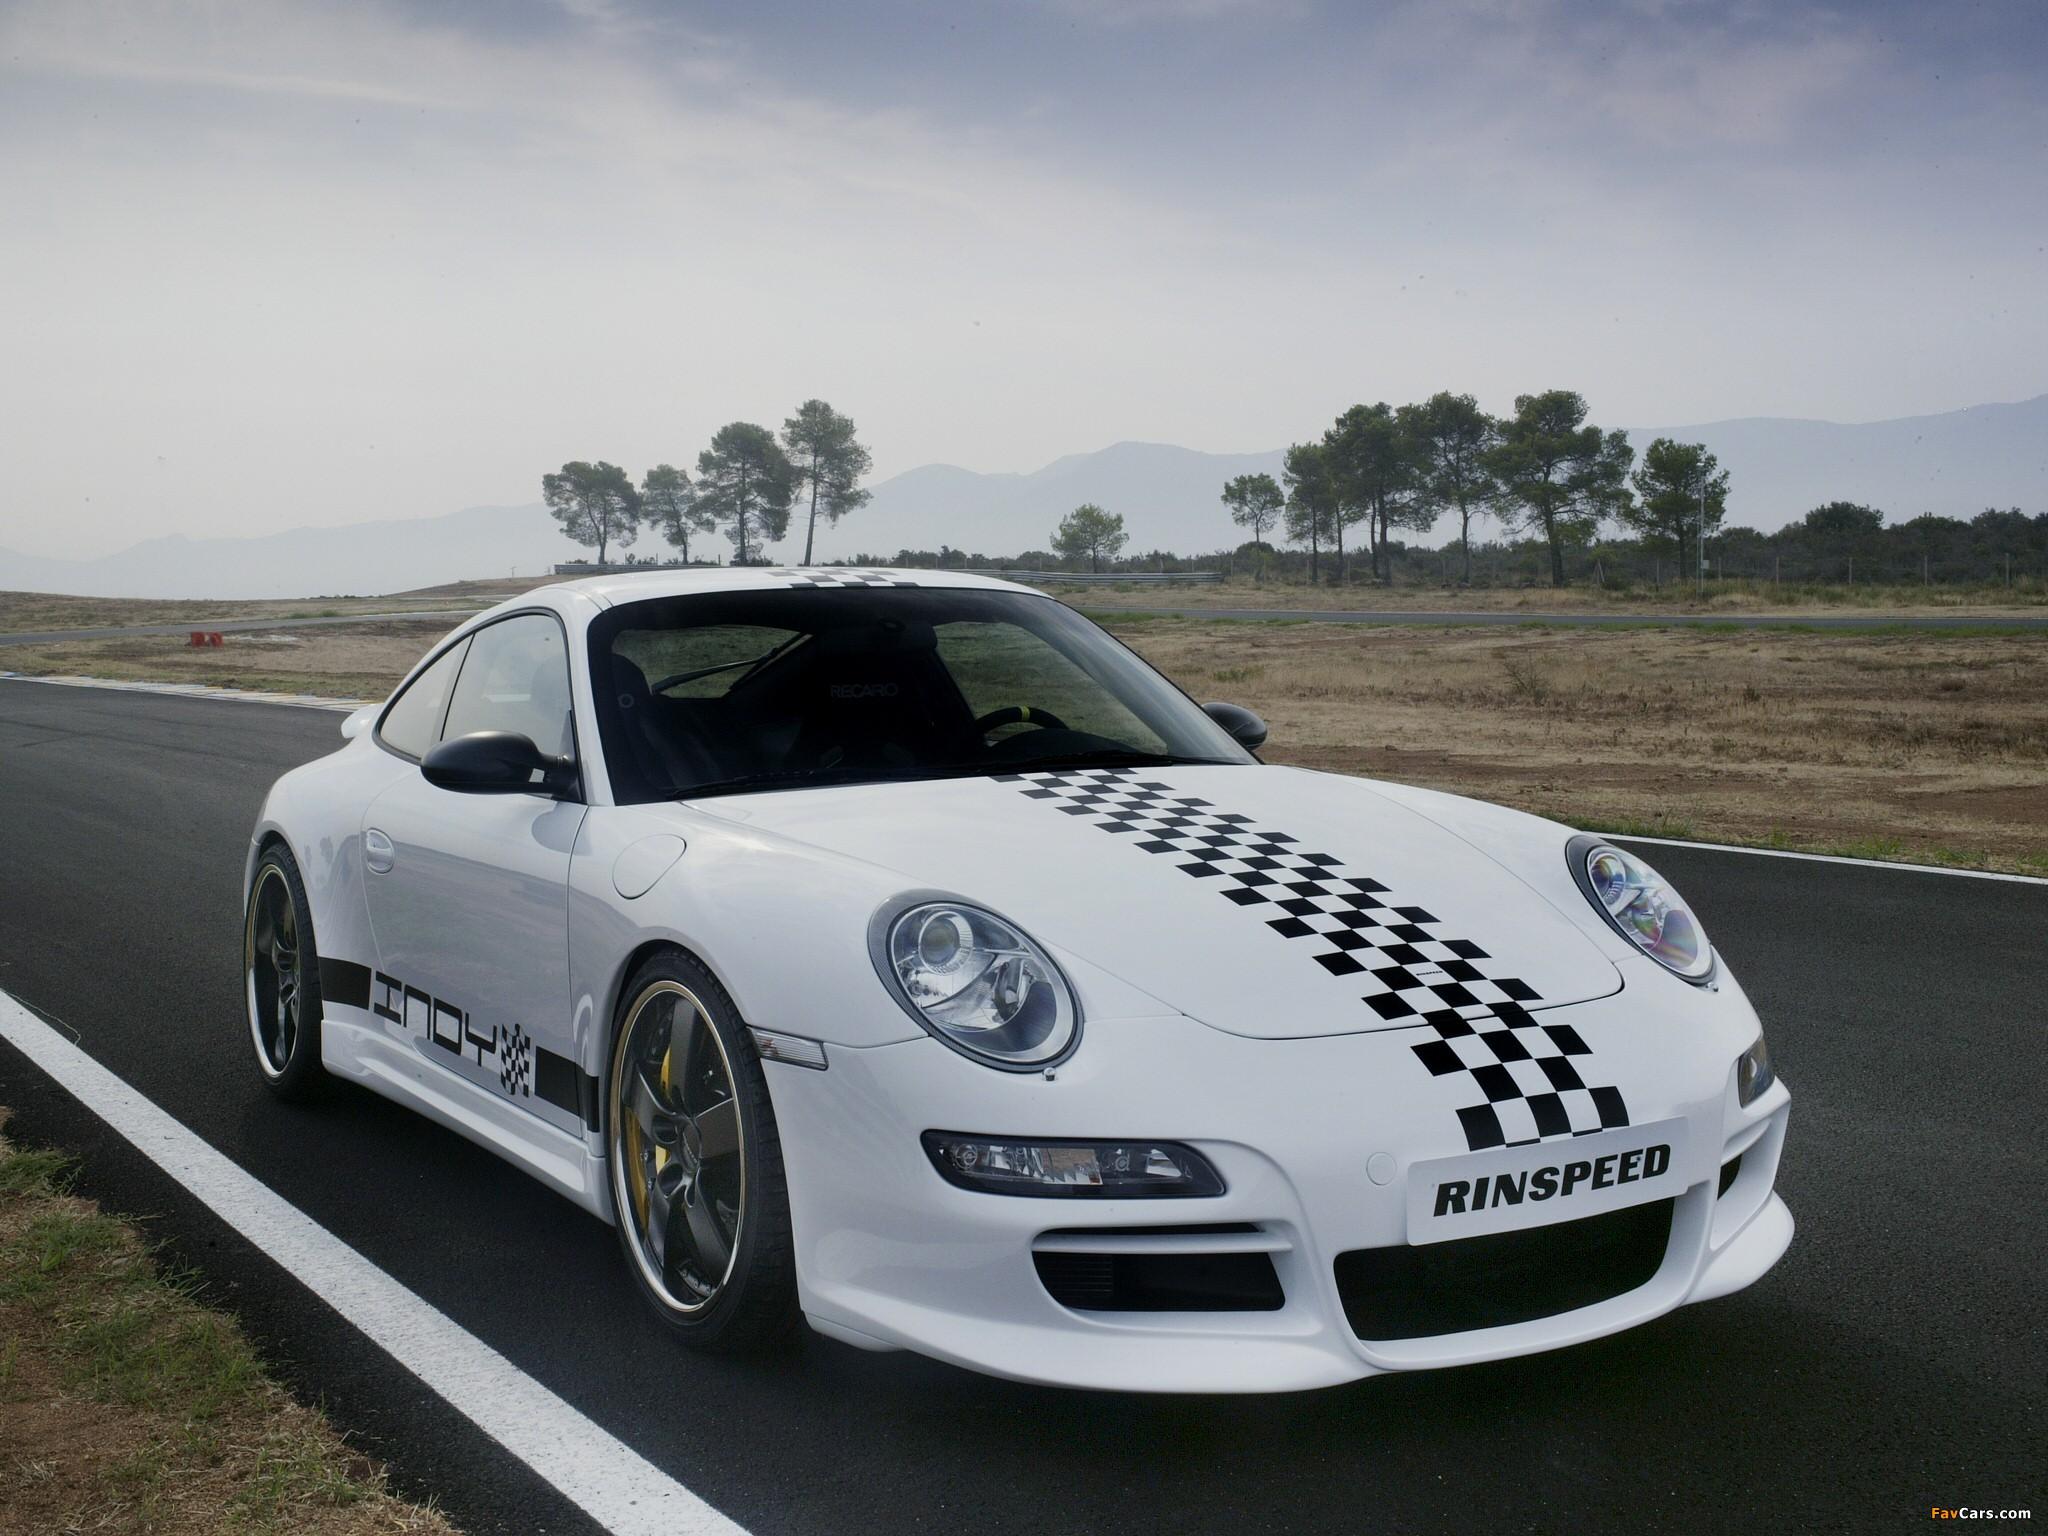 Pictures of Rinspeed Porsche Indy (997) 2005 (2048 x 1536)